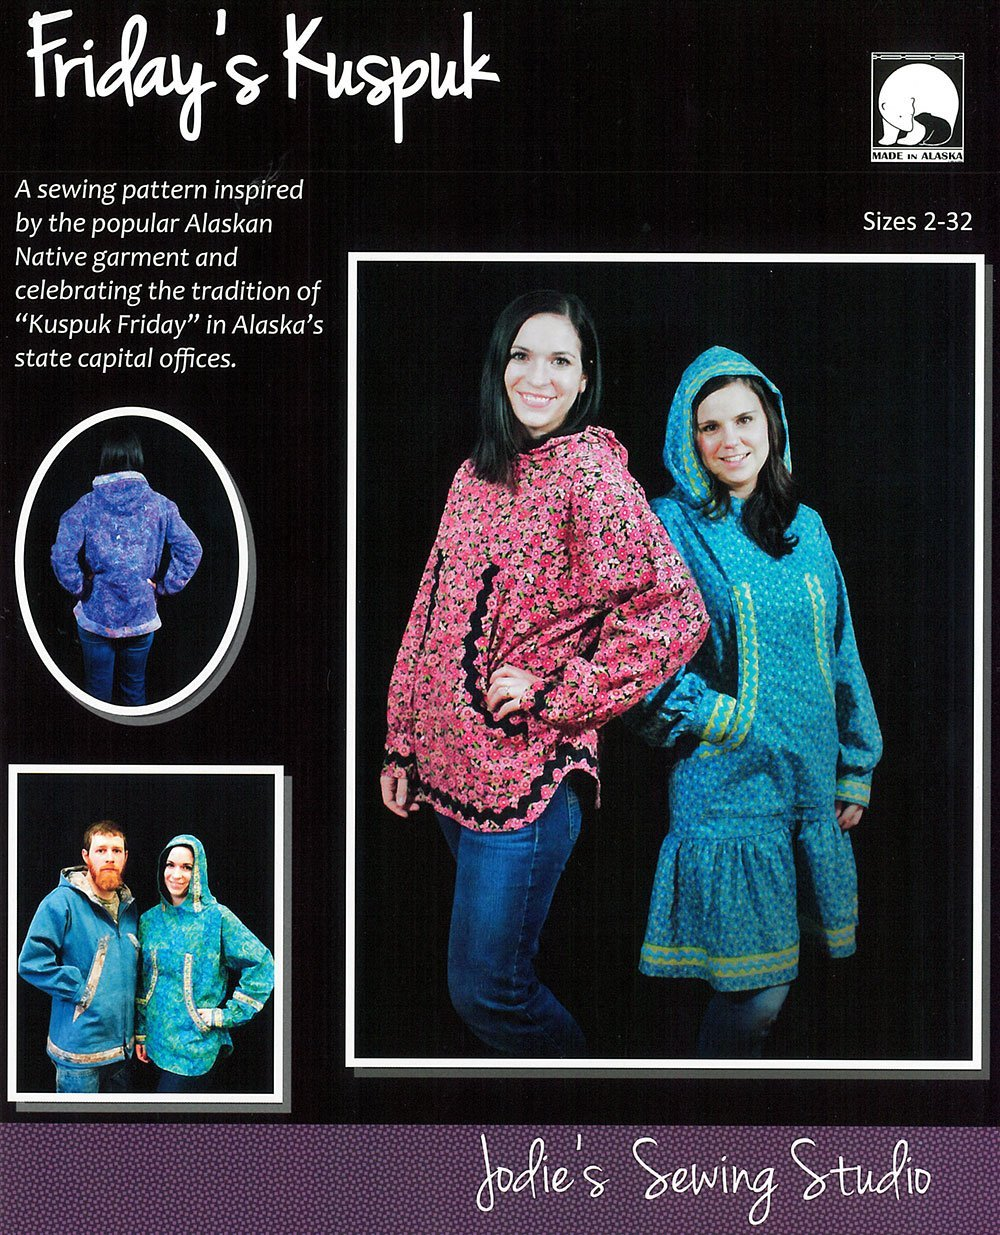 Jodie's Sewing Studio Friday's Kuspuk Size's 2-32